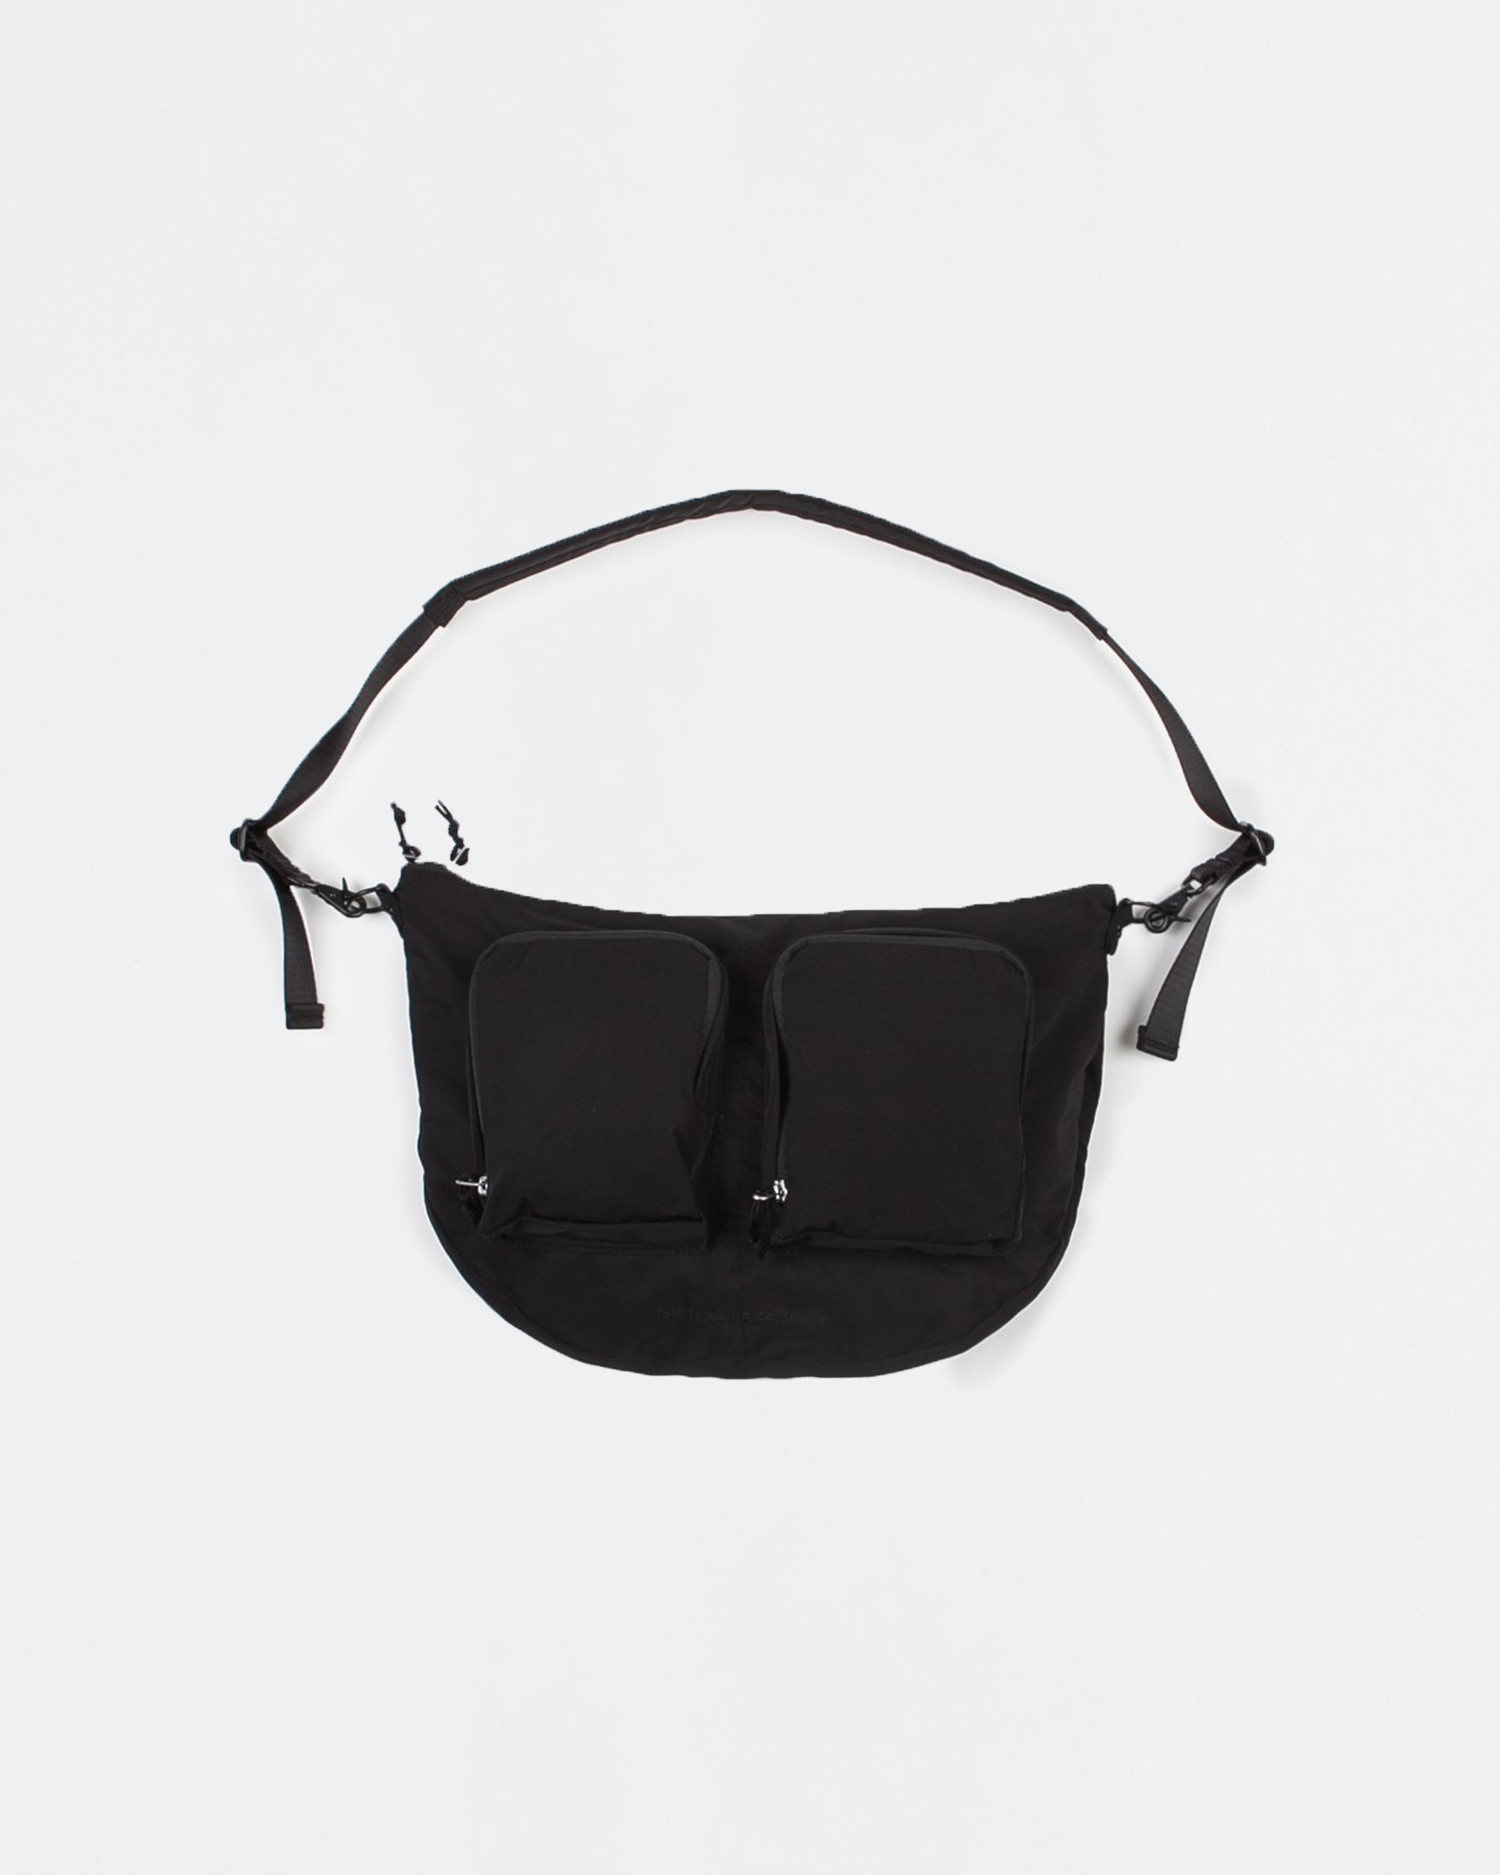 Copy of Carhartt x Pop Trading Co Shopper Bag Black